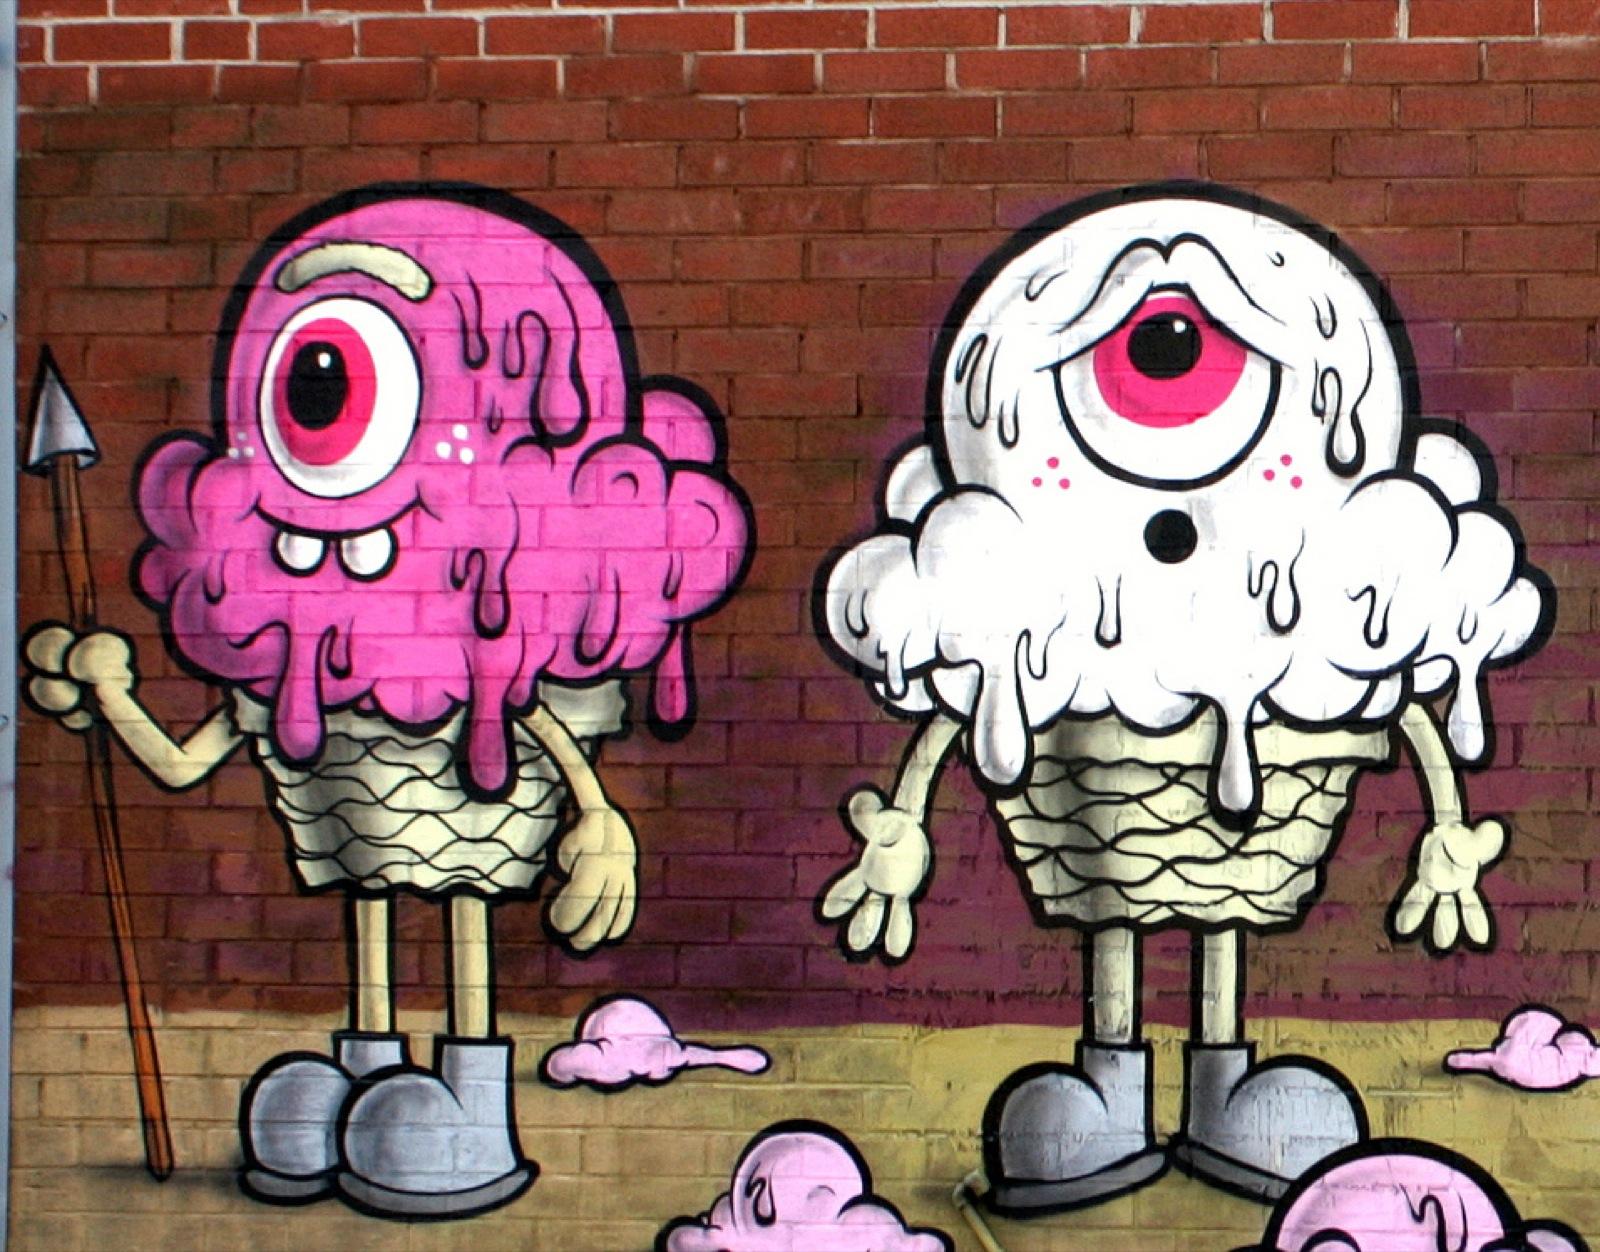 Buff Monster New Mural In New York City Usa Streetartnews